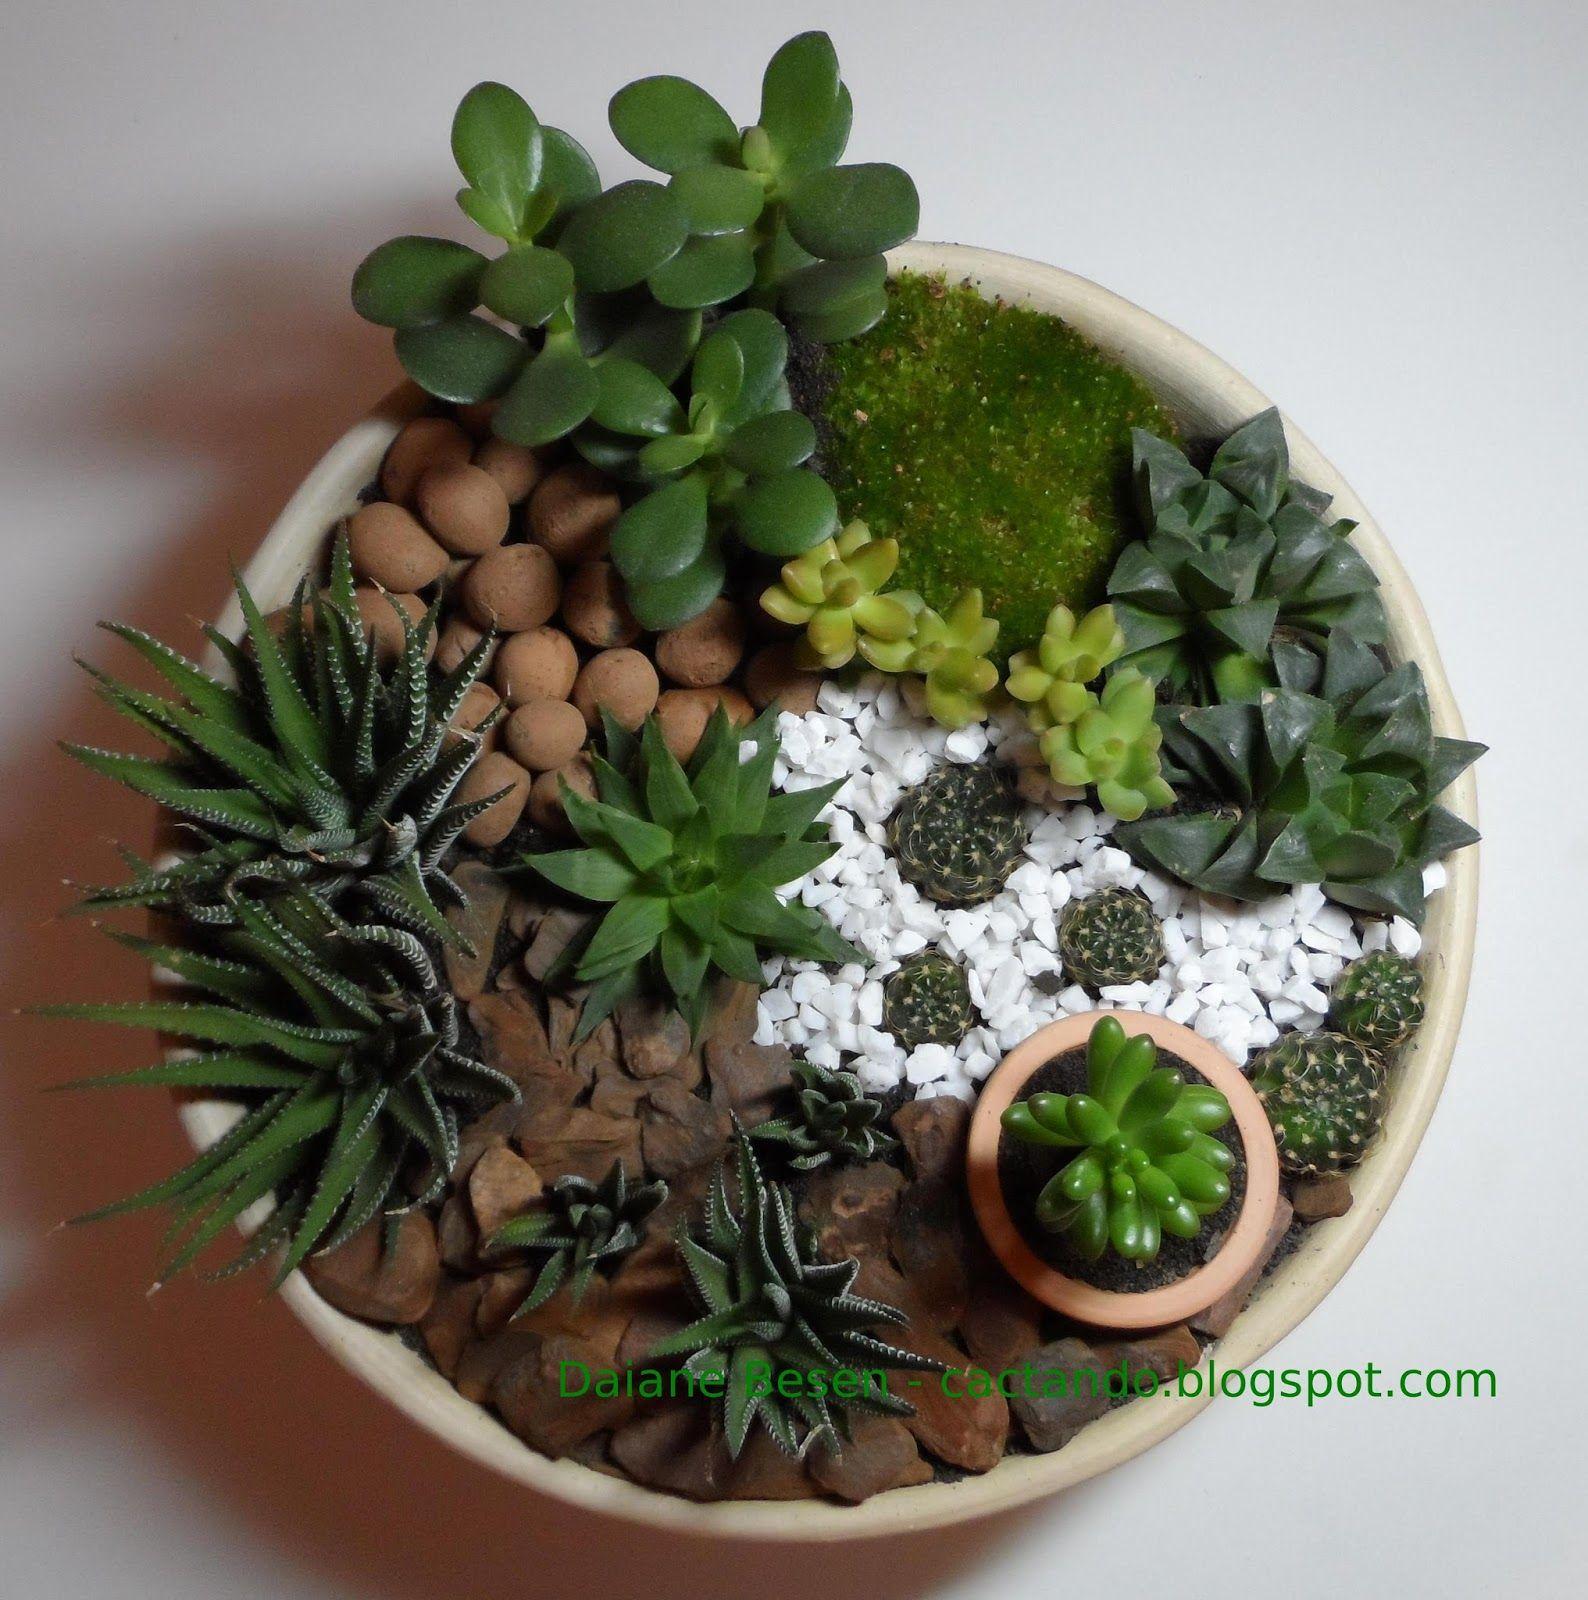 Mini jardim de suculentas e cactus mini garden plantas for Jardines pequenos redondos